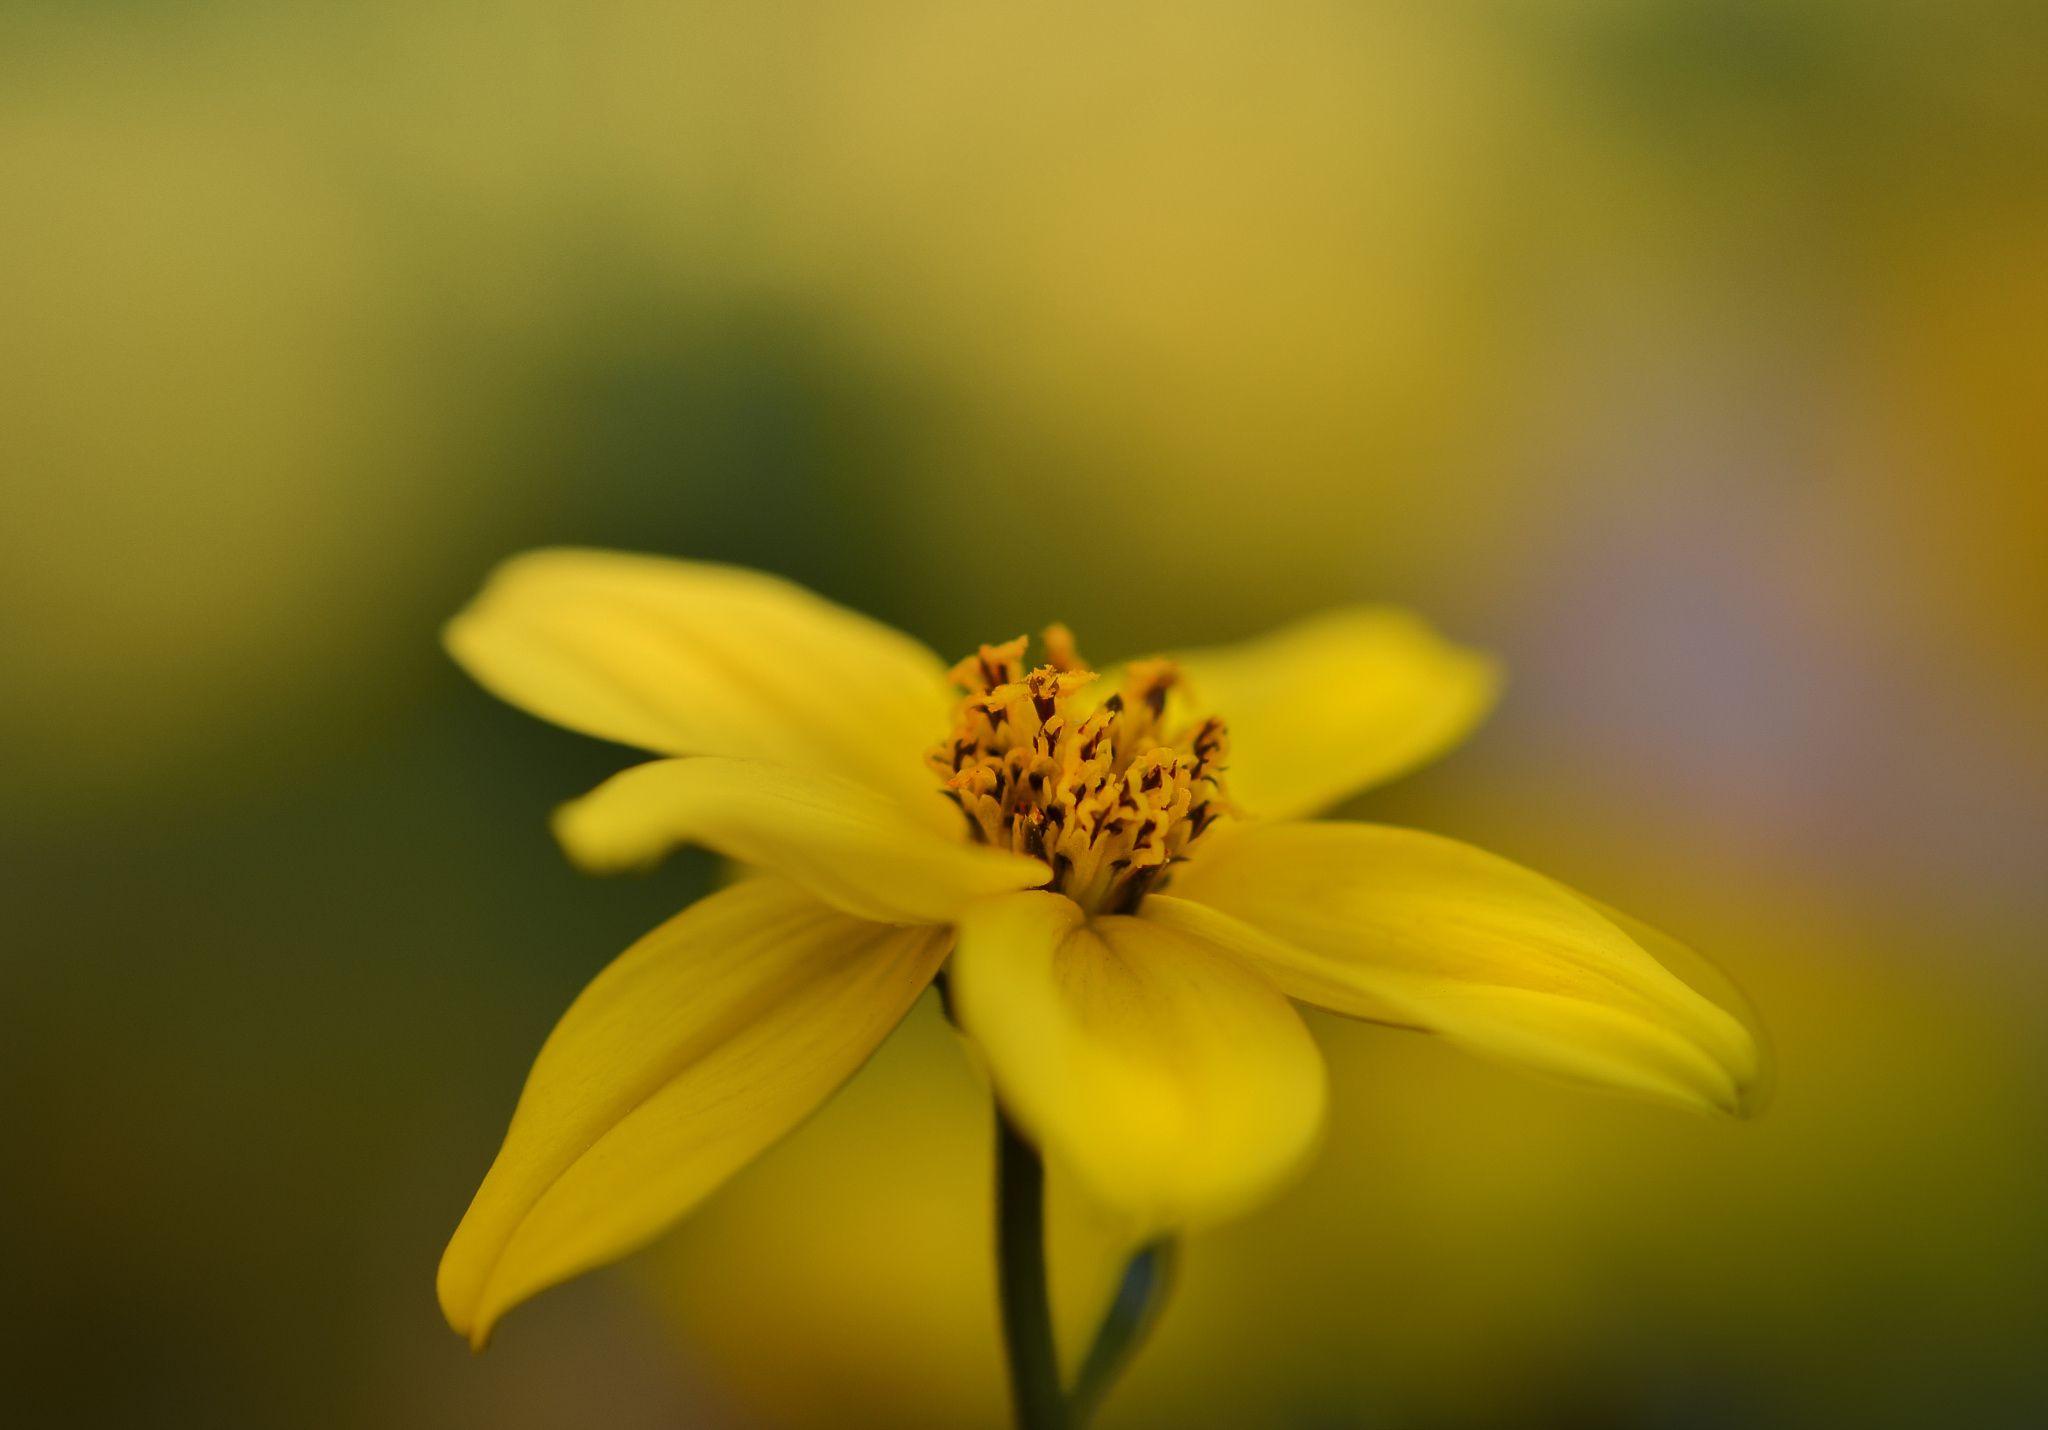 Thinking Yellow - null